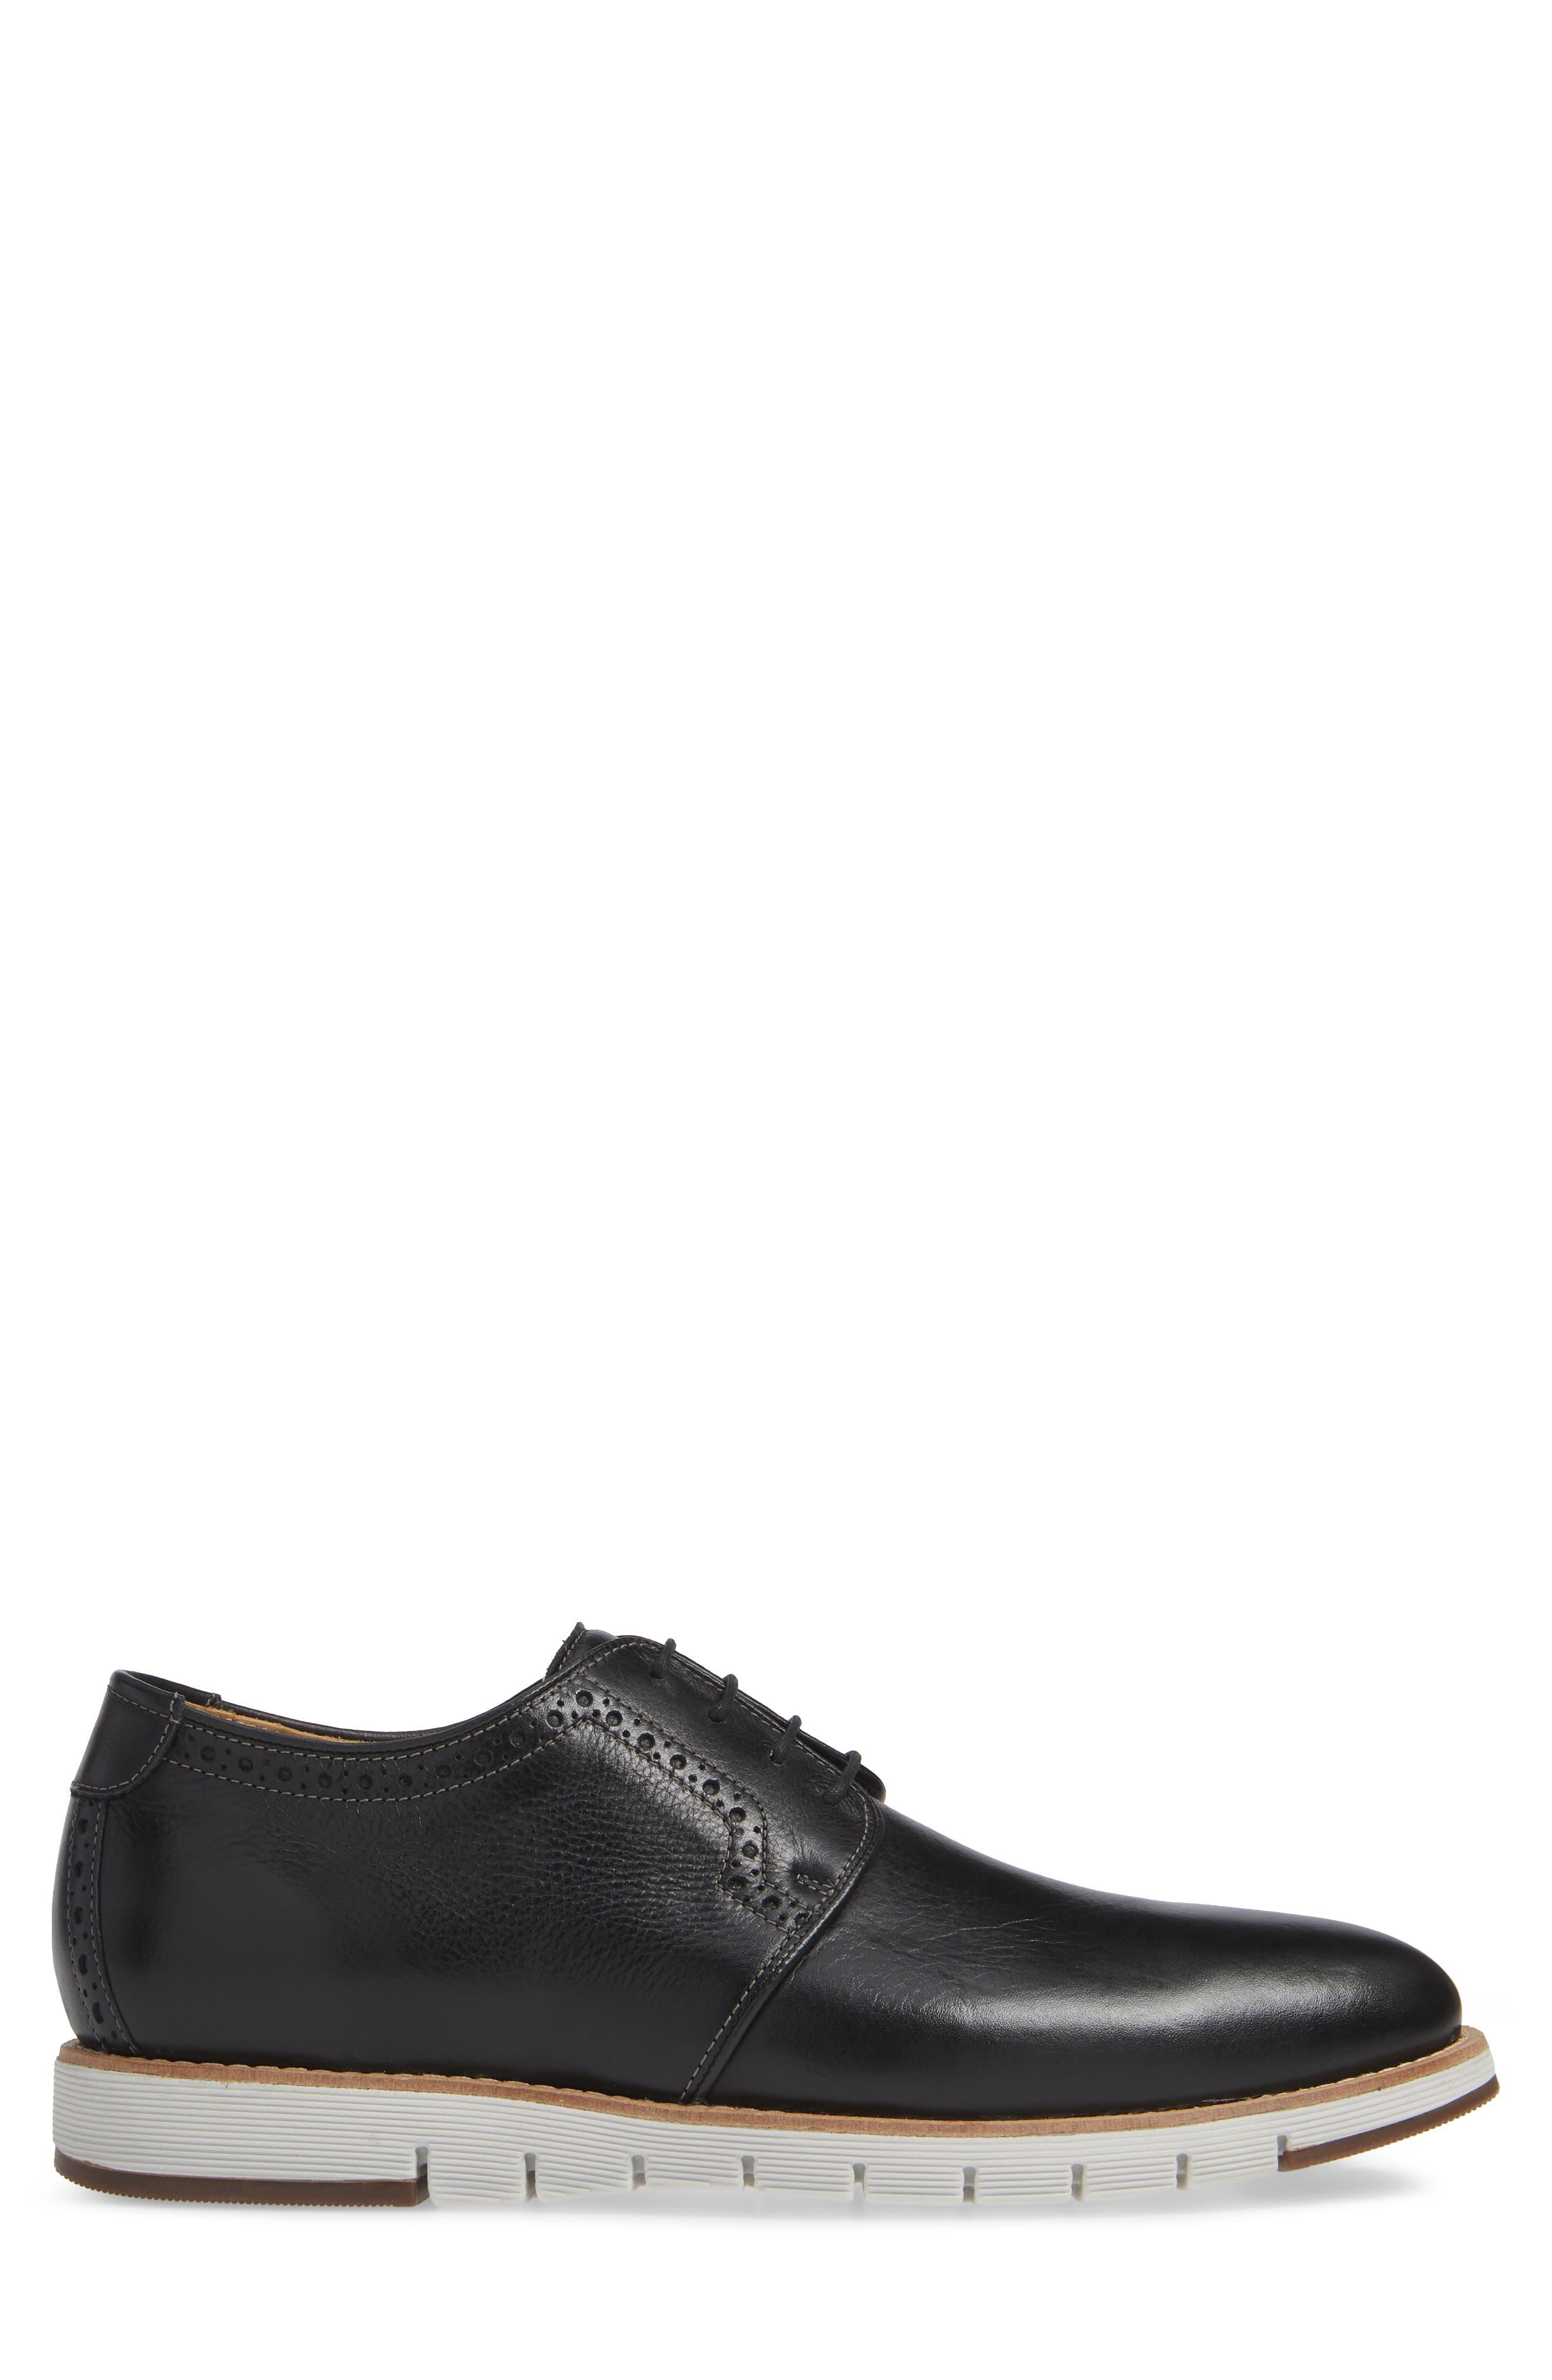 Martell Plain Toe Derby,                             Alternate thumbnail 3, color,                             BLACK LEATHER